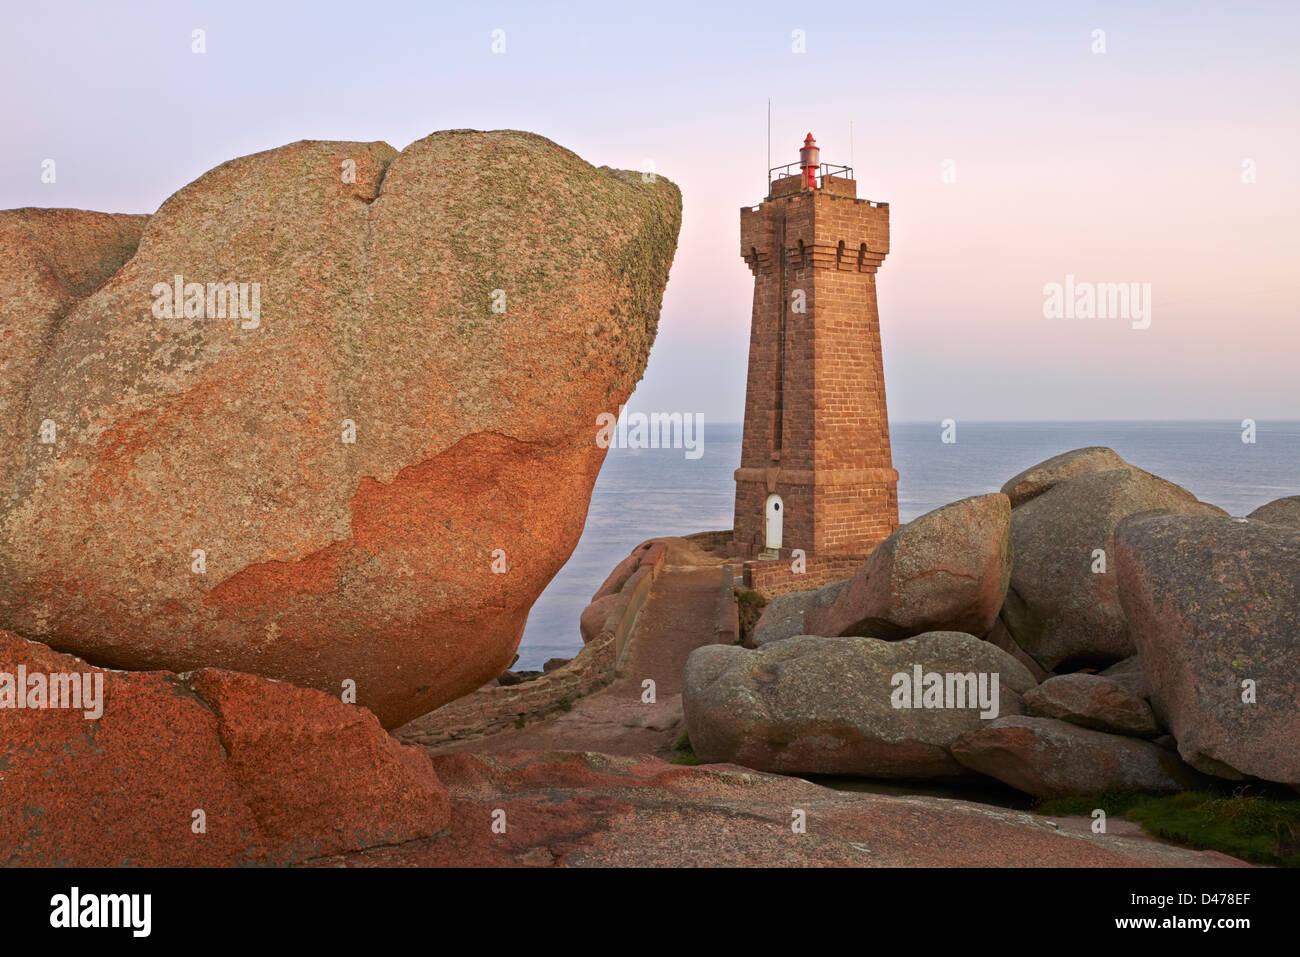 France, Brittany, Cotes d'Armor (22), Cotes de Granite Rose, Ploumanac'h, Squewel end and Mean Ruz Lighthouse - Stock Image